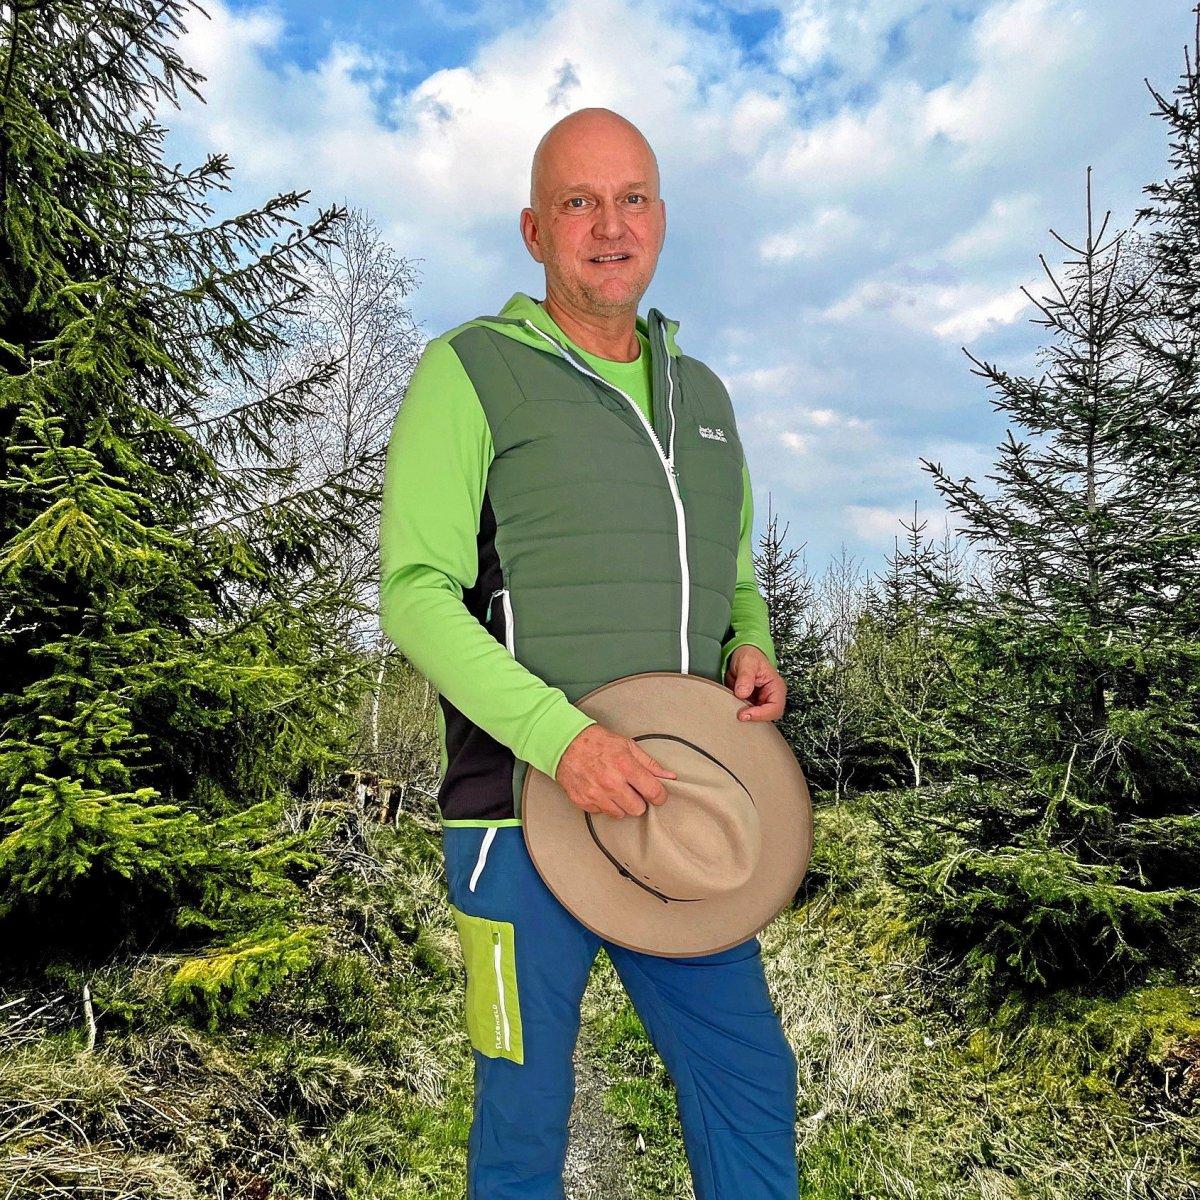 partnervermittlung sauerland singles bergen